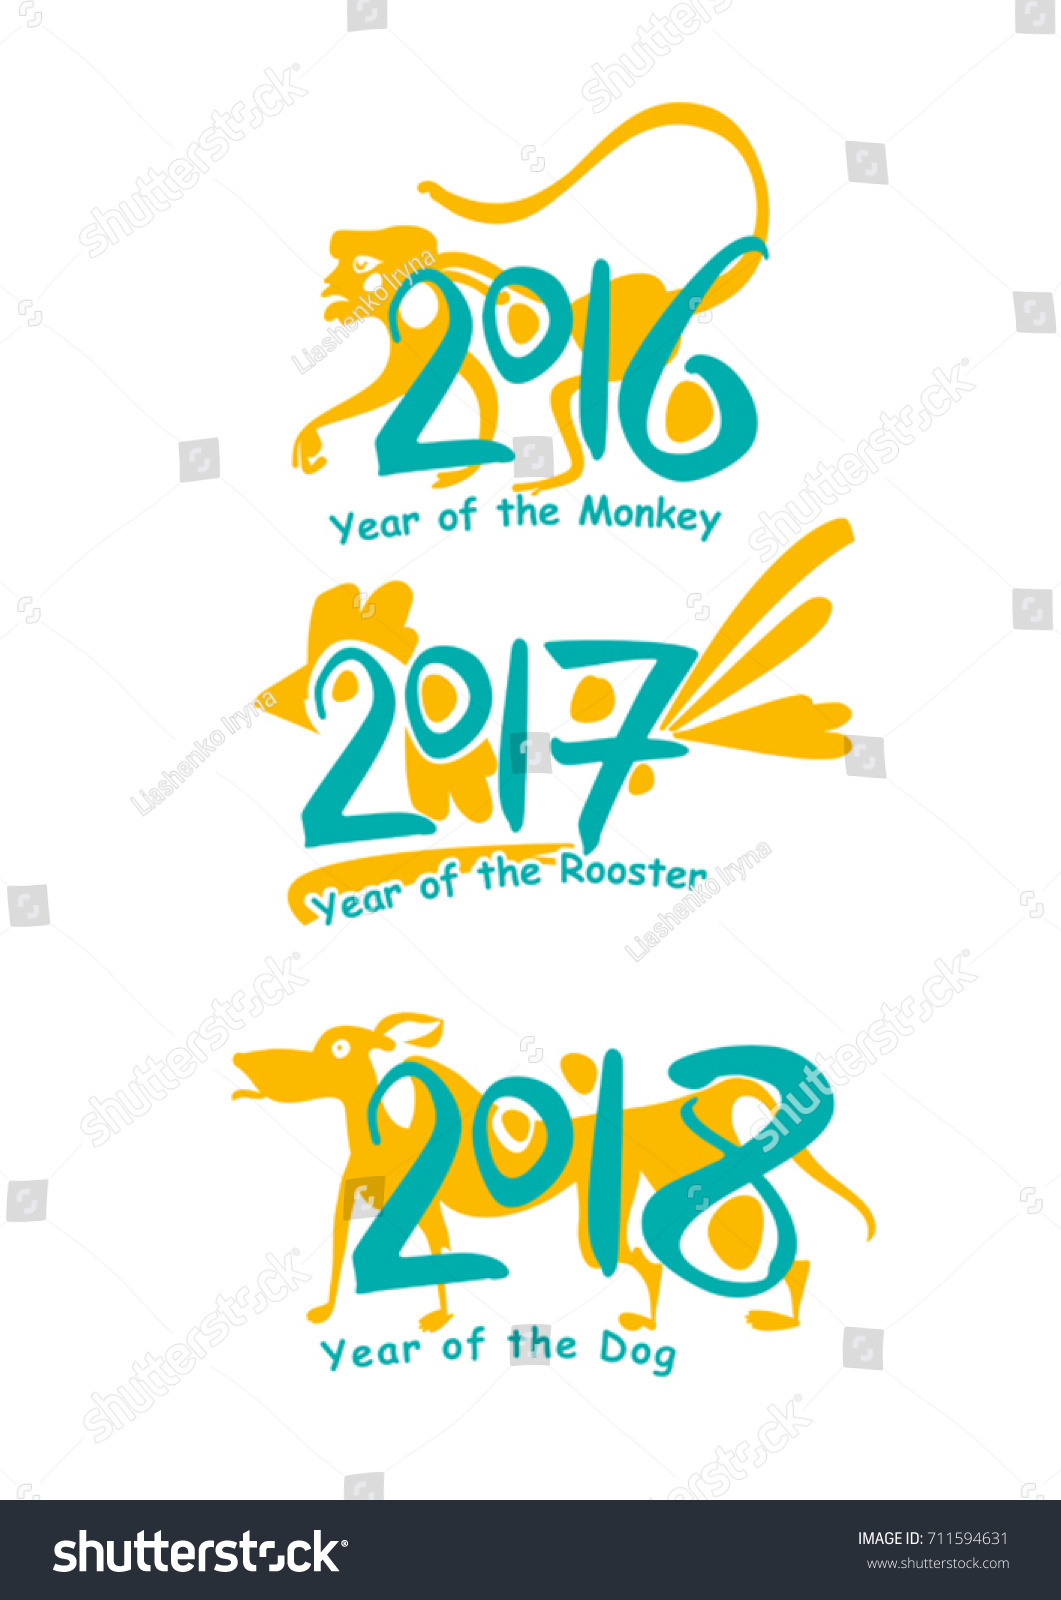 Monkey 2016 rooster 2017 dog 2018 stock vector 711594631 shutterstock monkey 2016 rooster 2017 dog 2018 vector template handwritten figures symbols of buycottarizona Gallery